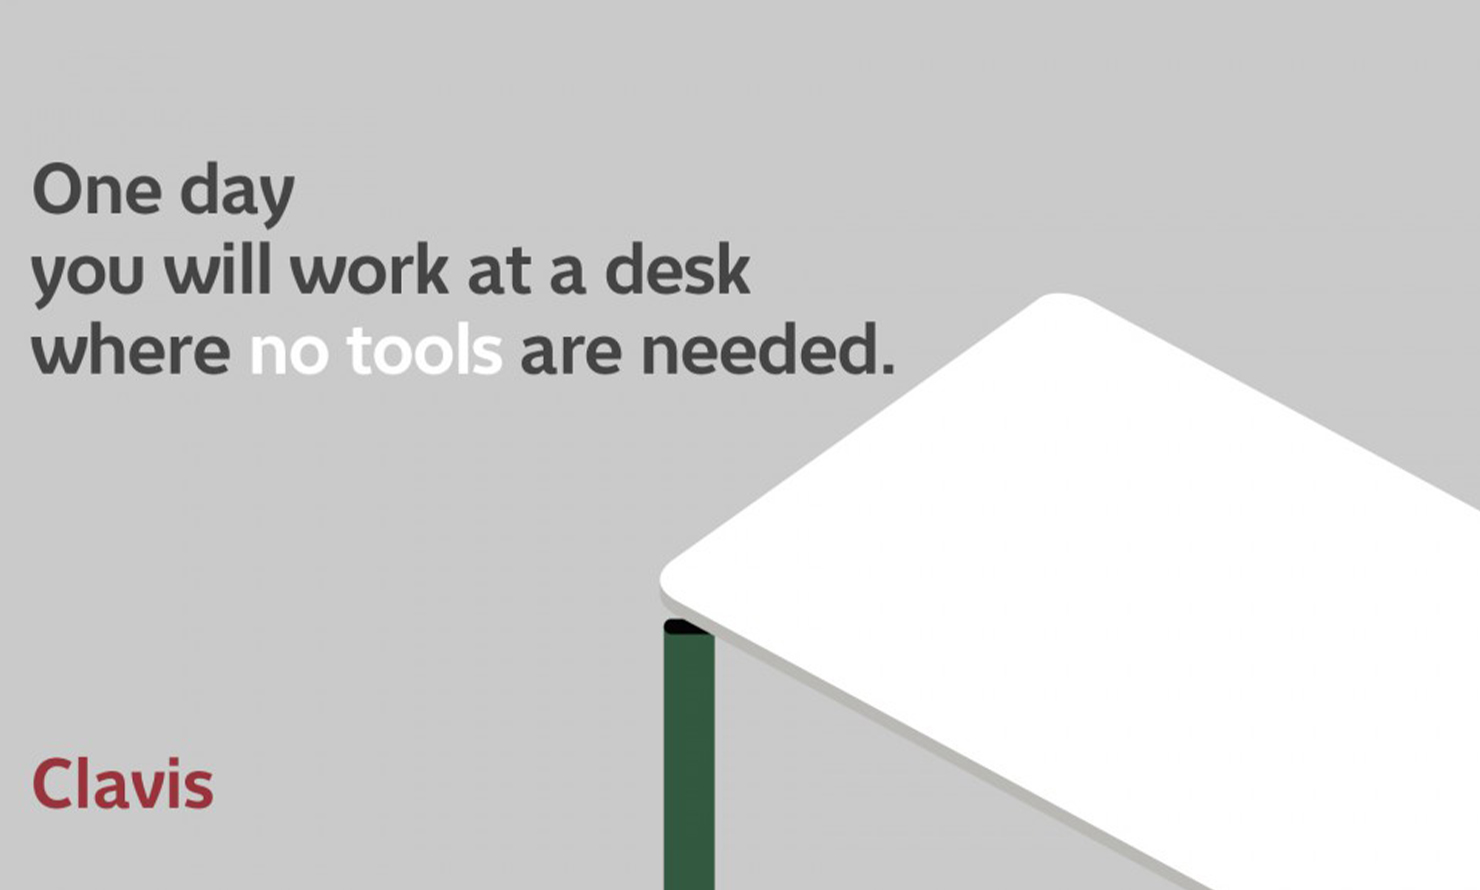 https://www.kubelibre.com/uploads/Slider-work-tutti-clienti/tecno-redesigning-the-future-of-the-future-of-work-4.jpg